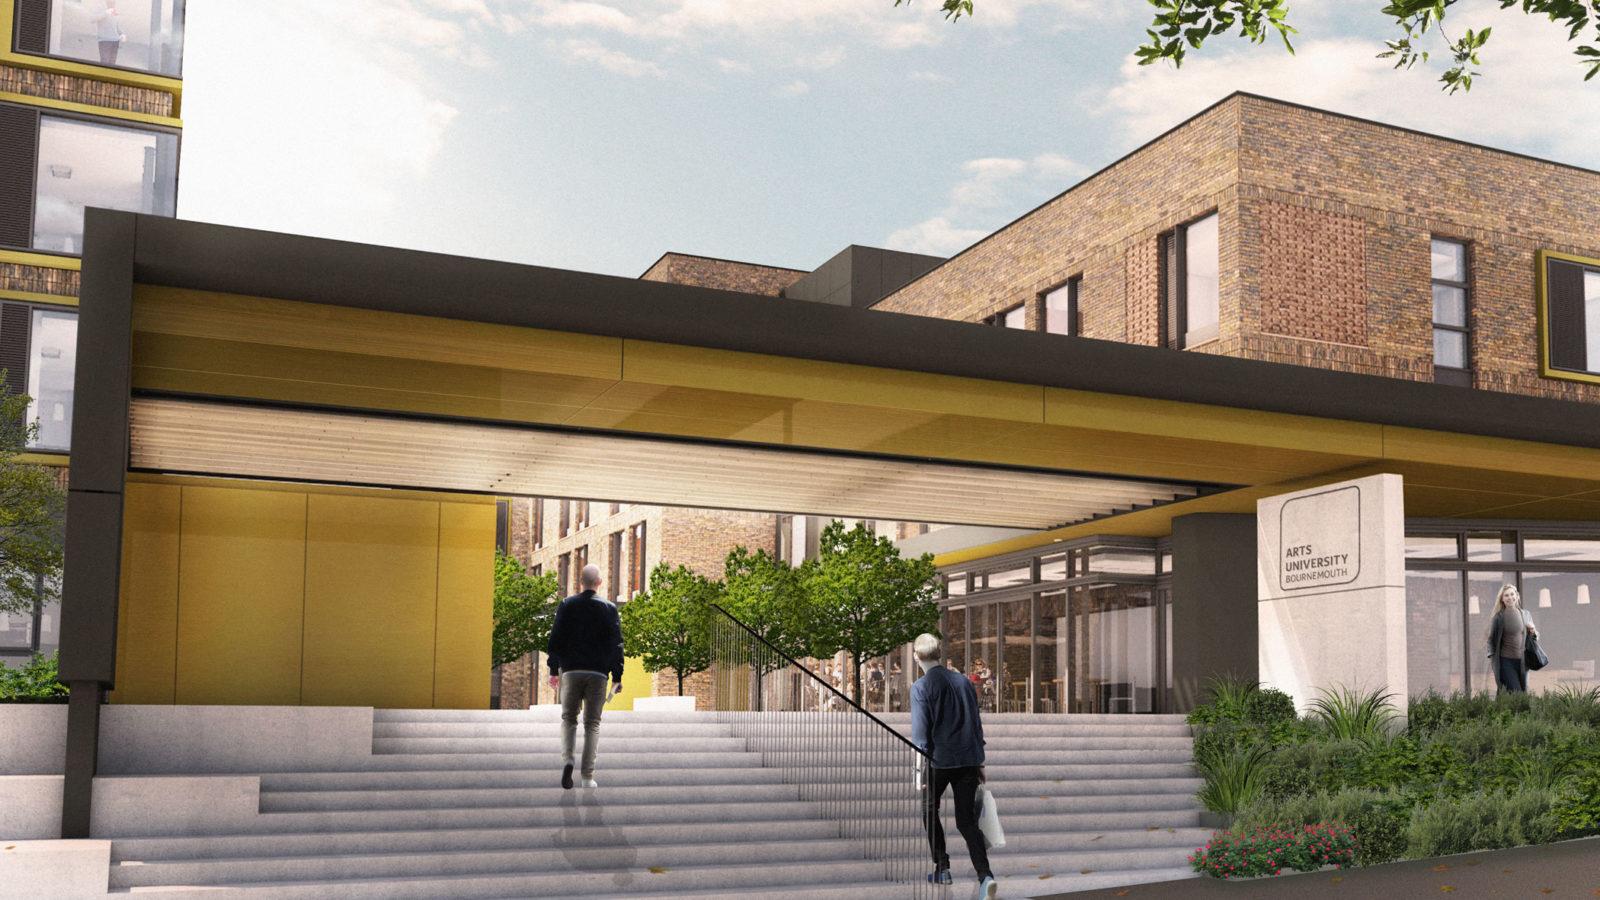 AUB Residential entrance canopy